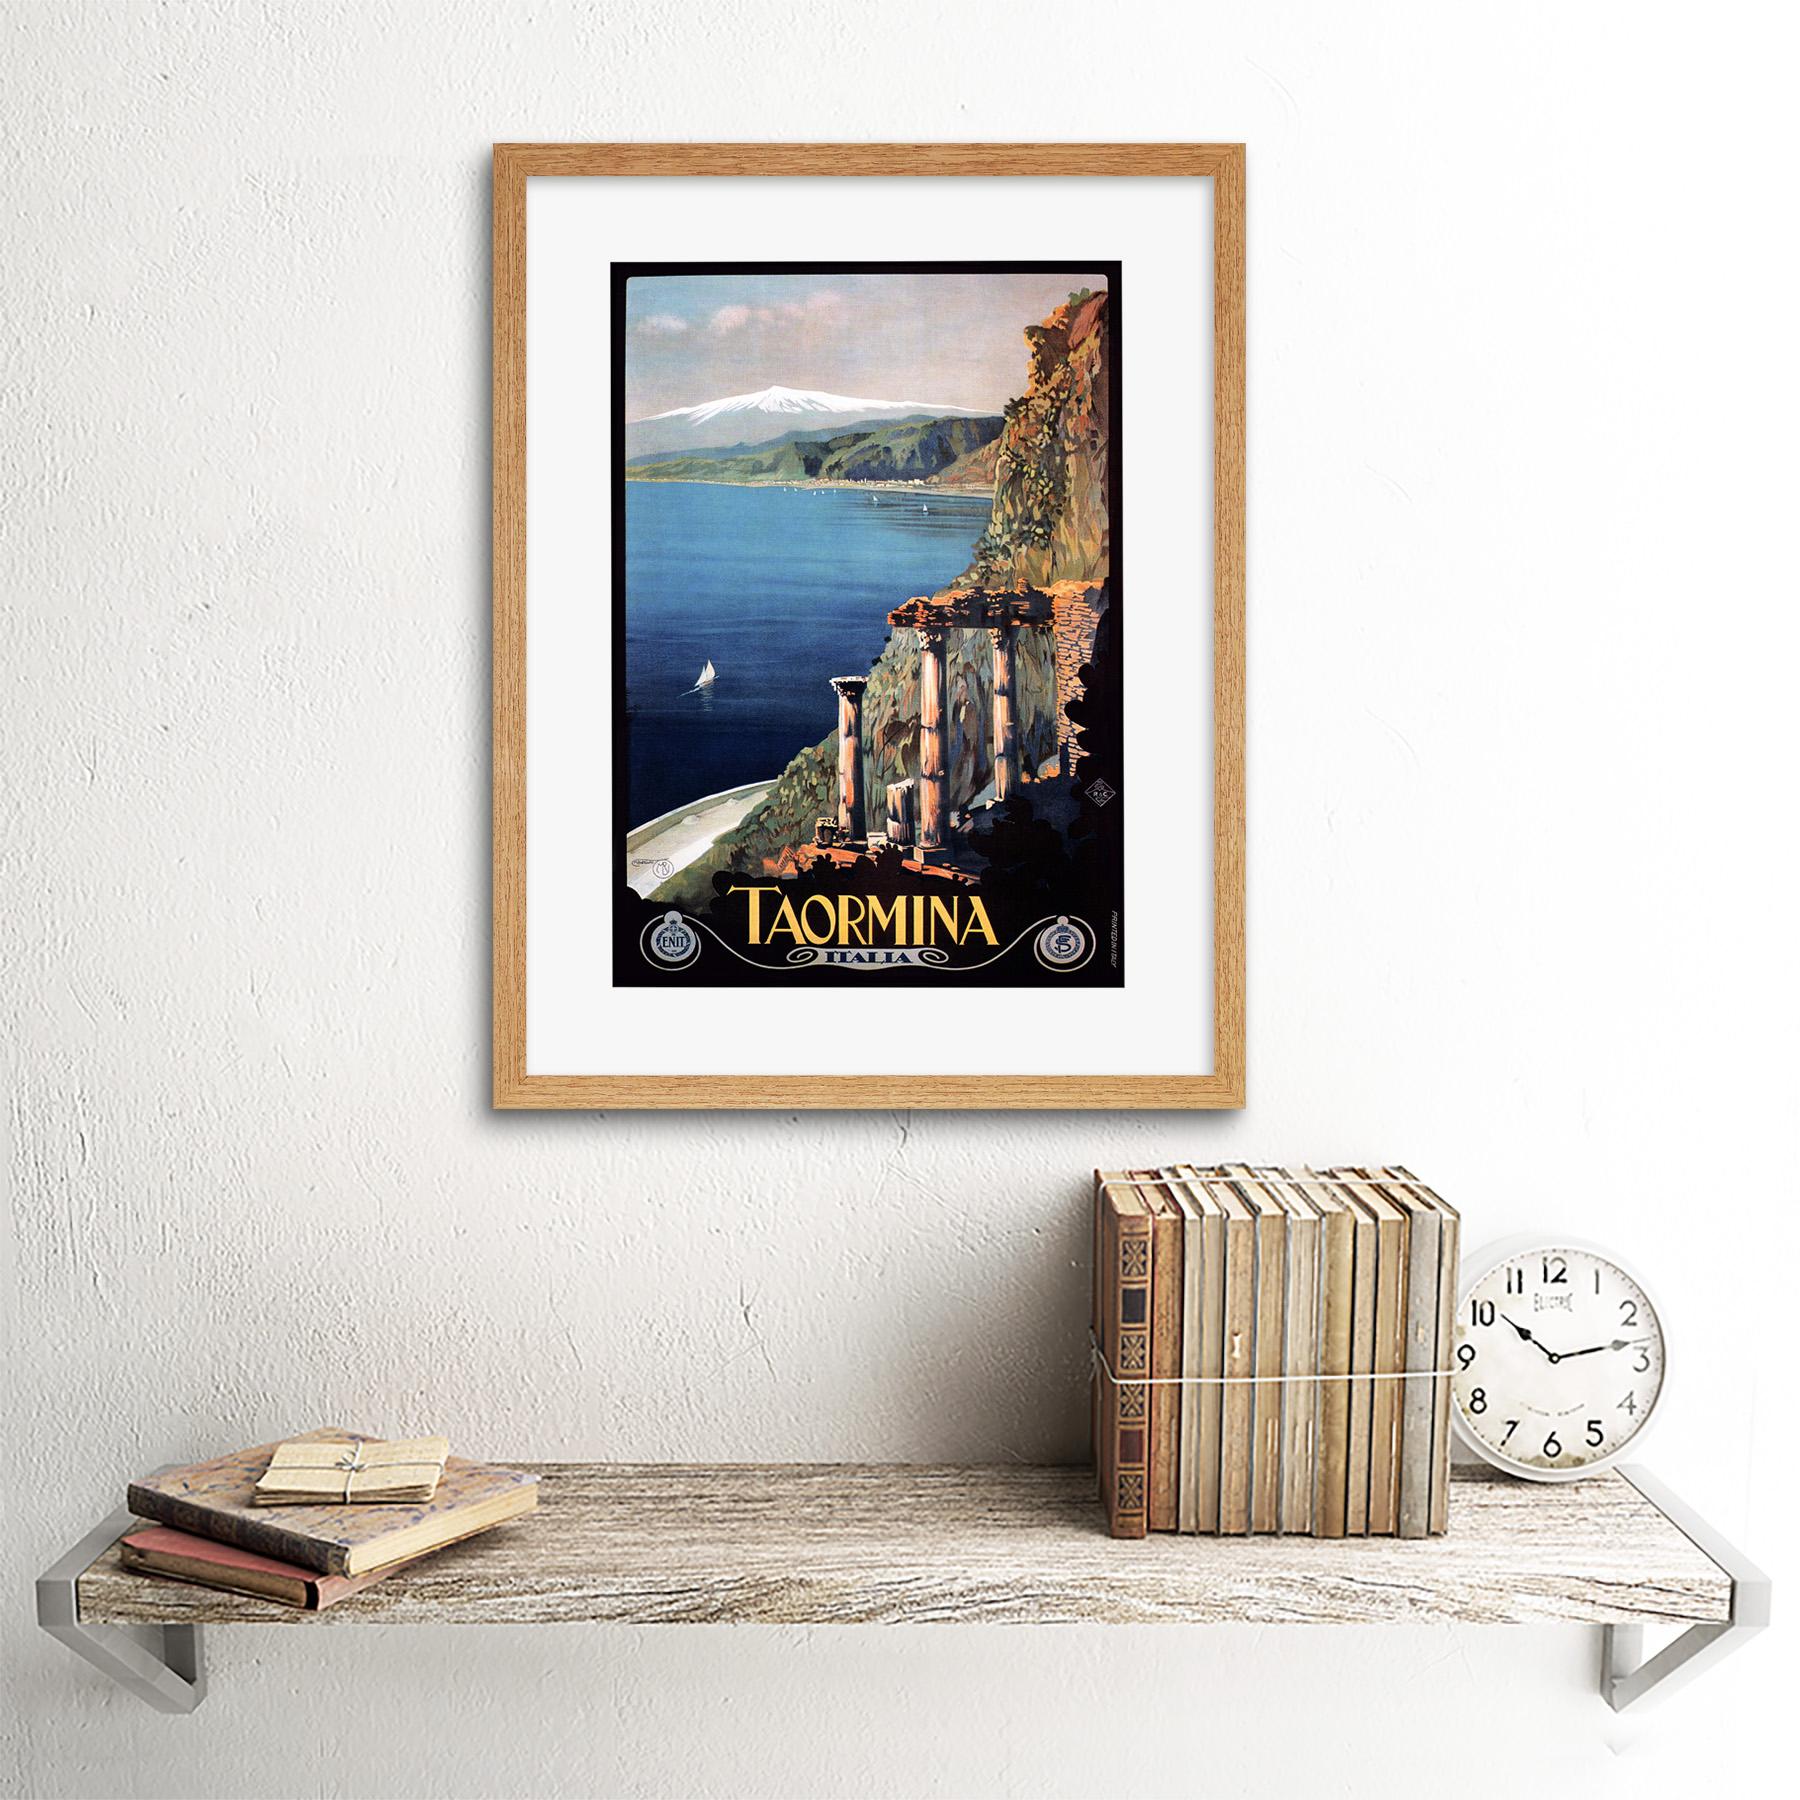 thumbnail 13 - Travel Taormina Sicily Etna Greek Theatre Italy Framed Art Print 12x16 Inch